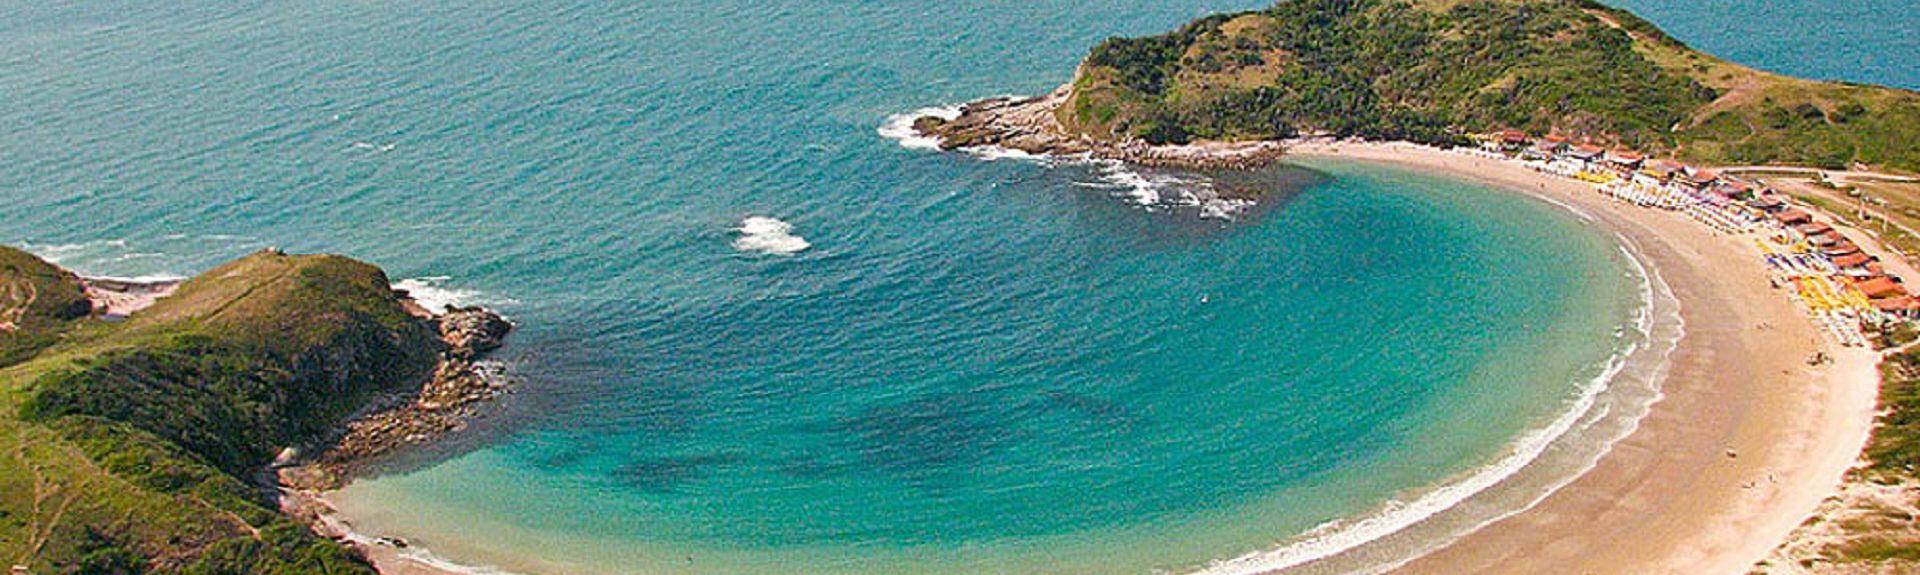 Praia do Siqueira, Cabo Frio, Rio de Janeiro, Brazil